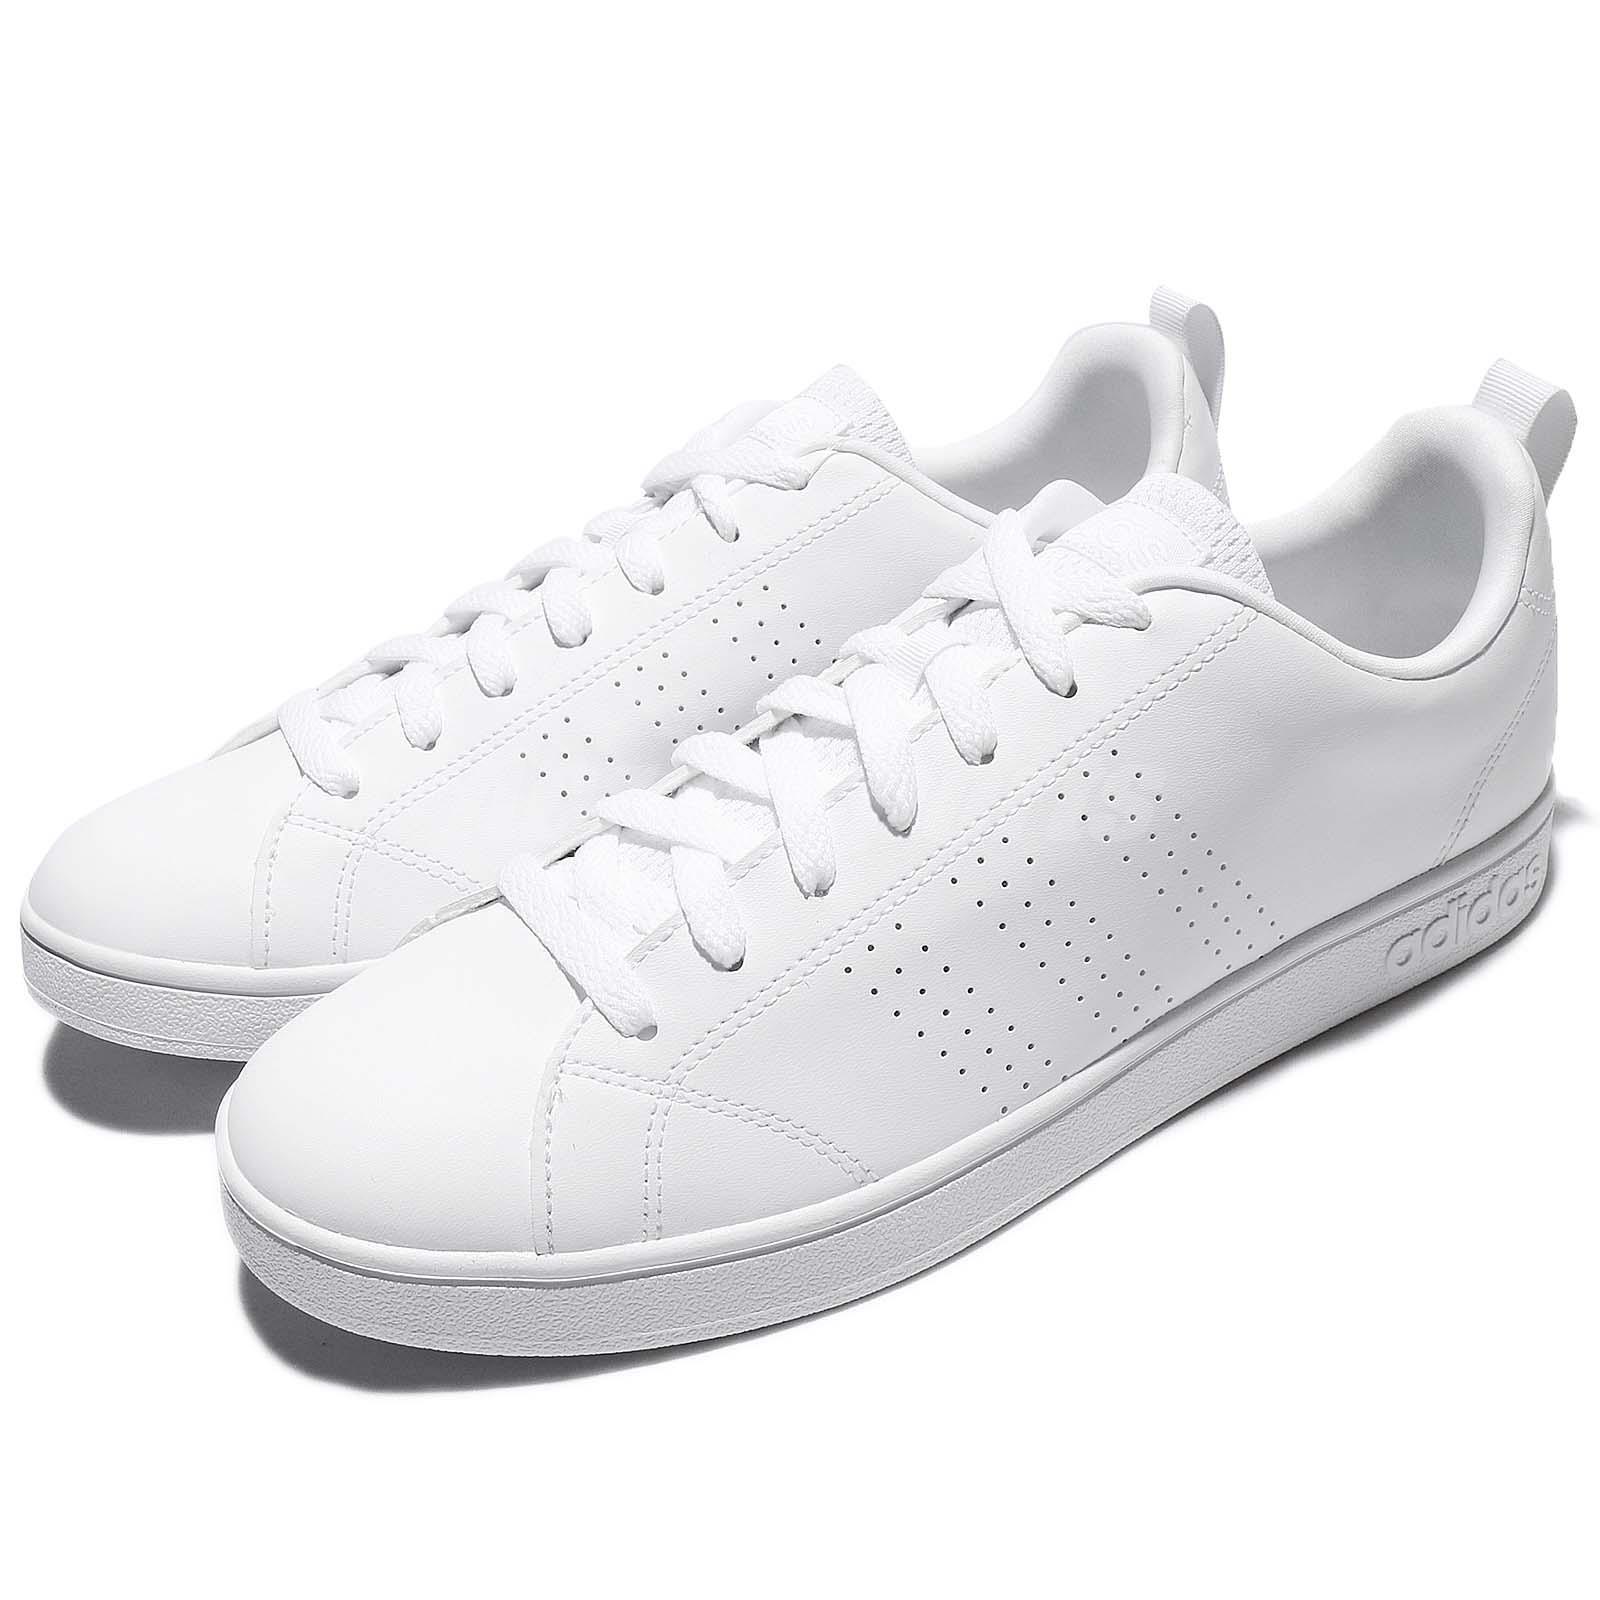 adidas Neo Advantage Clean VS Triple Blanc Men Casual Chaussures Baskets B74685